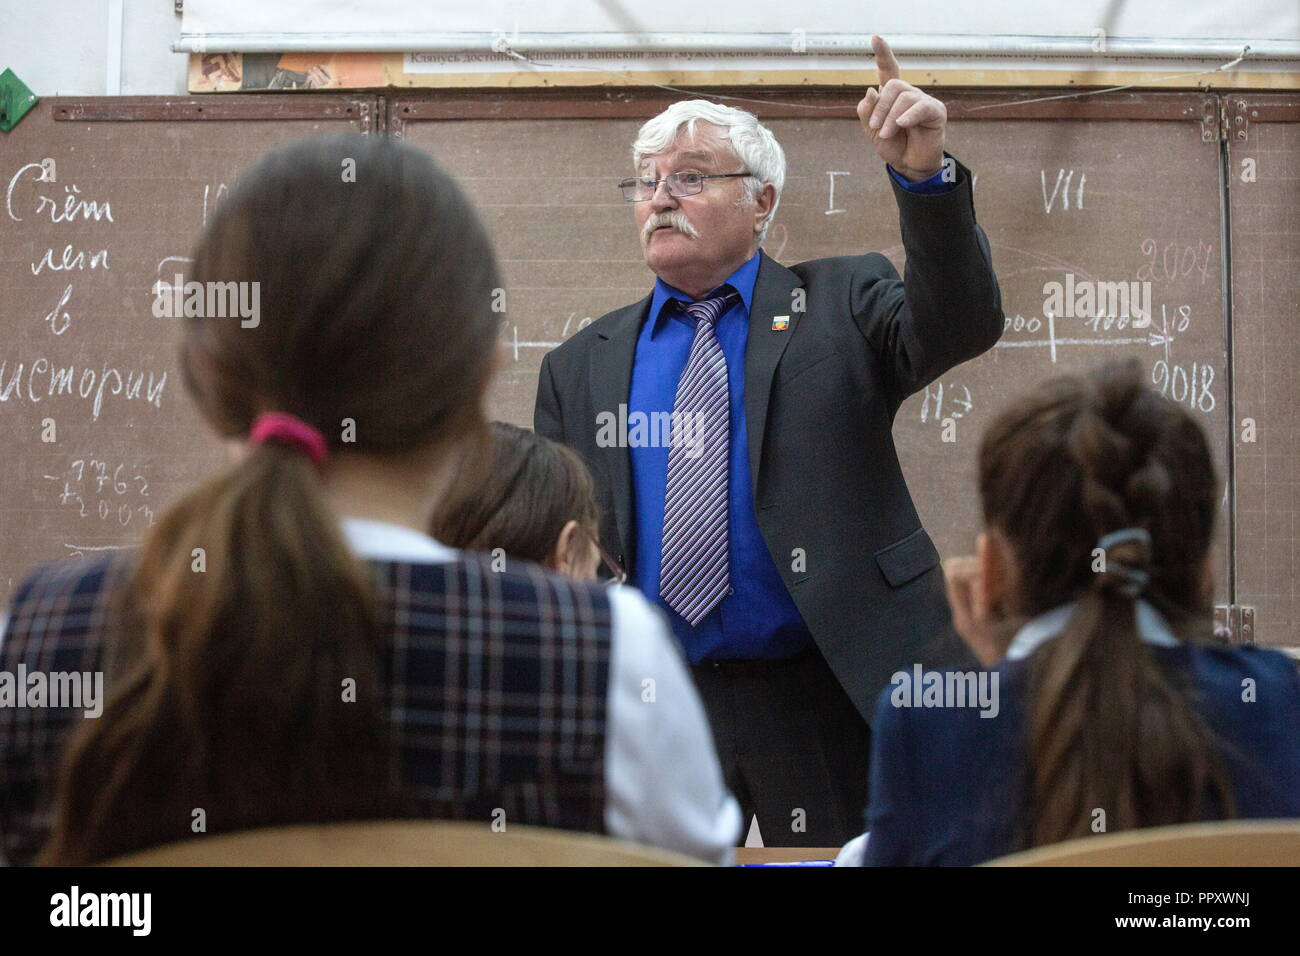 Russia. 27th Sep, 2018. OMSK REGION, RUSSIA - SEPTEMBER 27, 2018: Yakov Savenok, 65, teaches a history class at a secondary school in the village of Bogoslovka. Dmitry Feoktistov/TASS Credit: ITAR-TASS News Agency/Alamy Live News - Stock Image